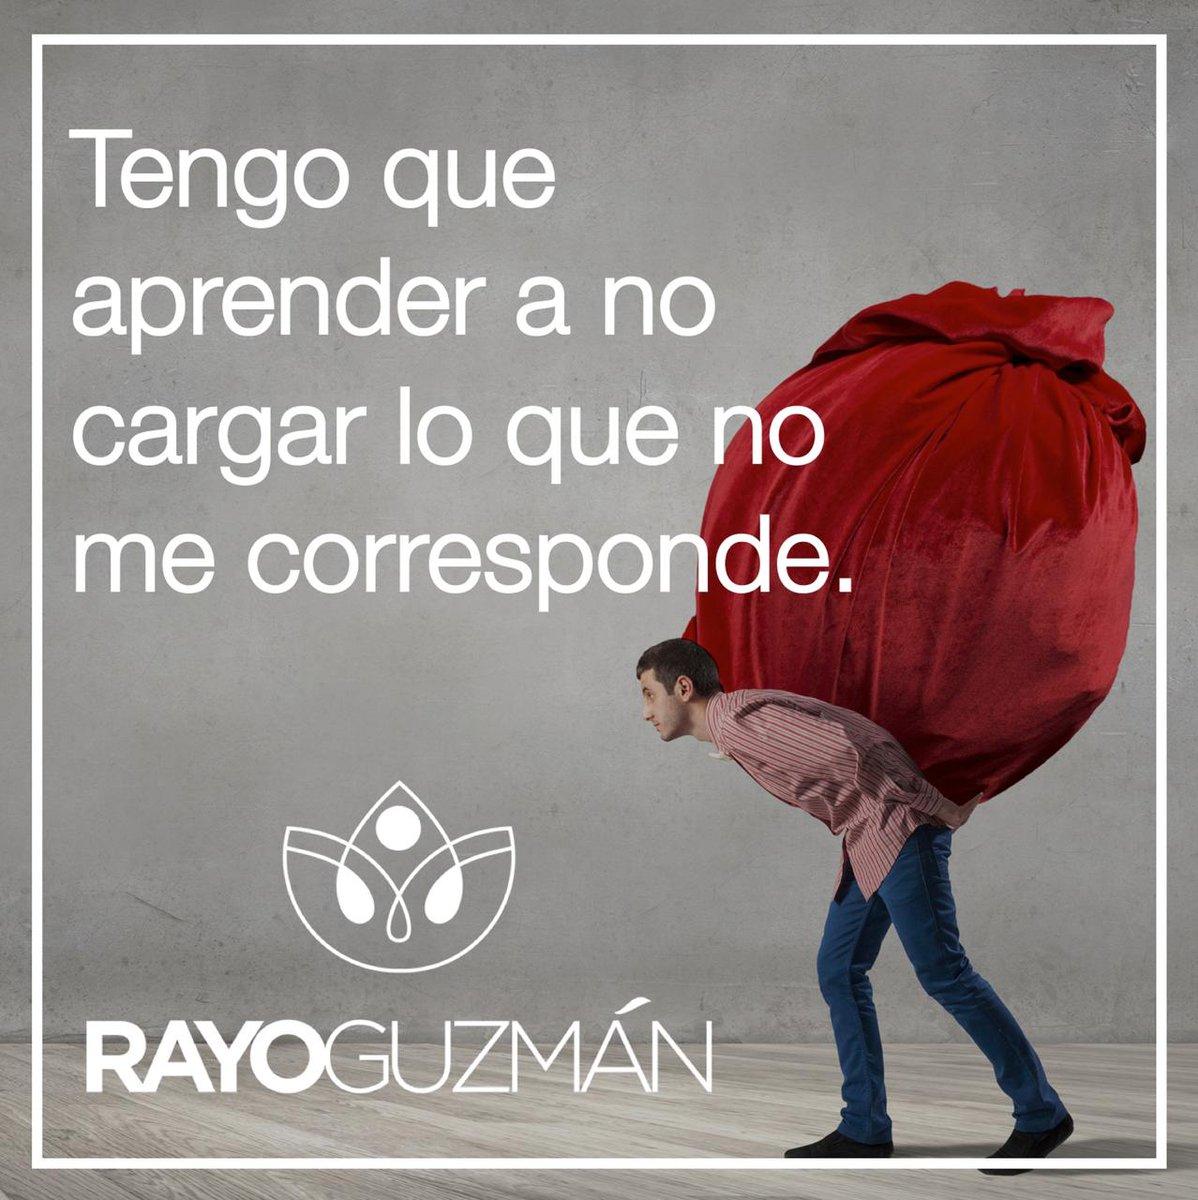 Gran, GRAN lección de vida, ¿no creen? #BuenosDias #FelizMartes